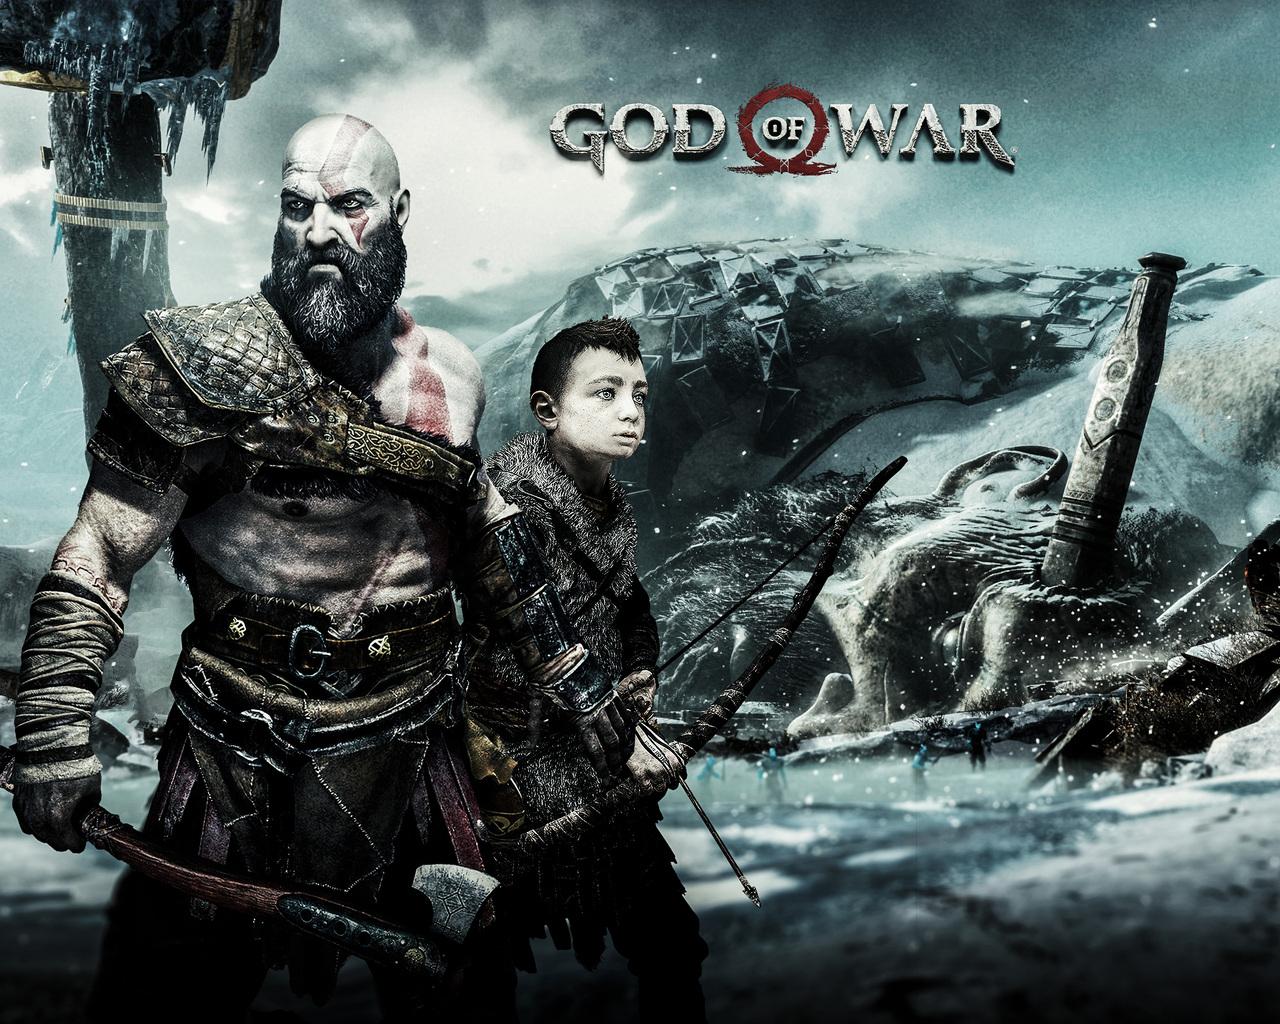 1280x1024 God Of War 4 Kratos And Atreus 1280x1024 Resolution Hd